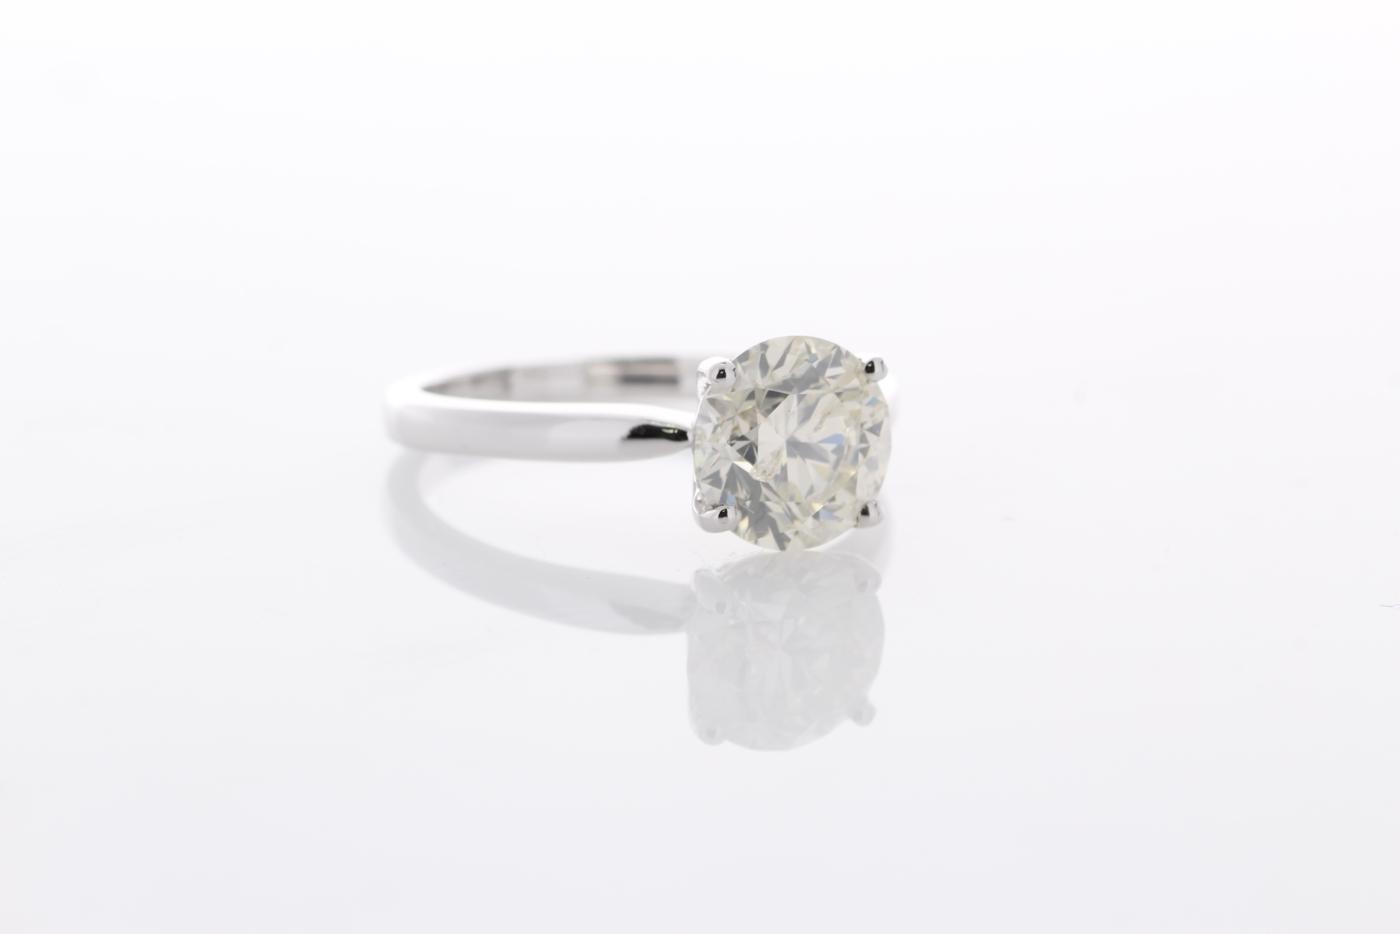 18ct White Gold Single Stone Prong Set Diamond Ring 2.02 Carats - Image 4 of 5